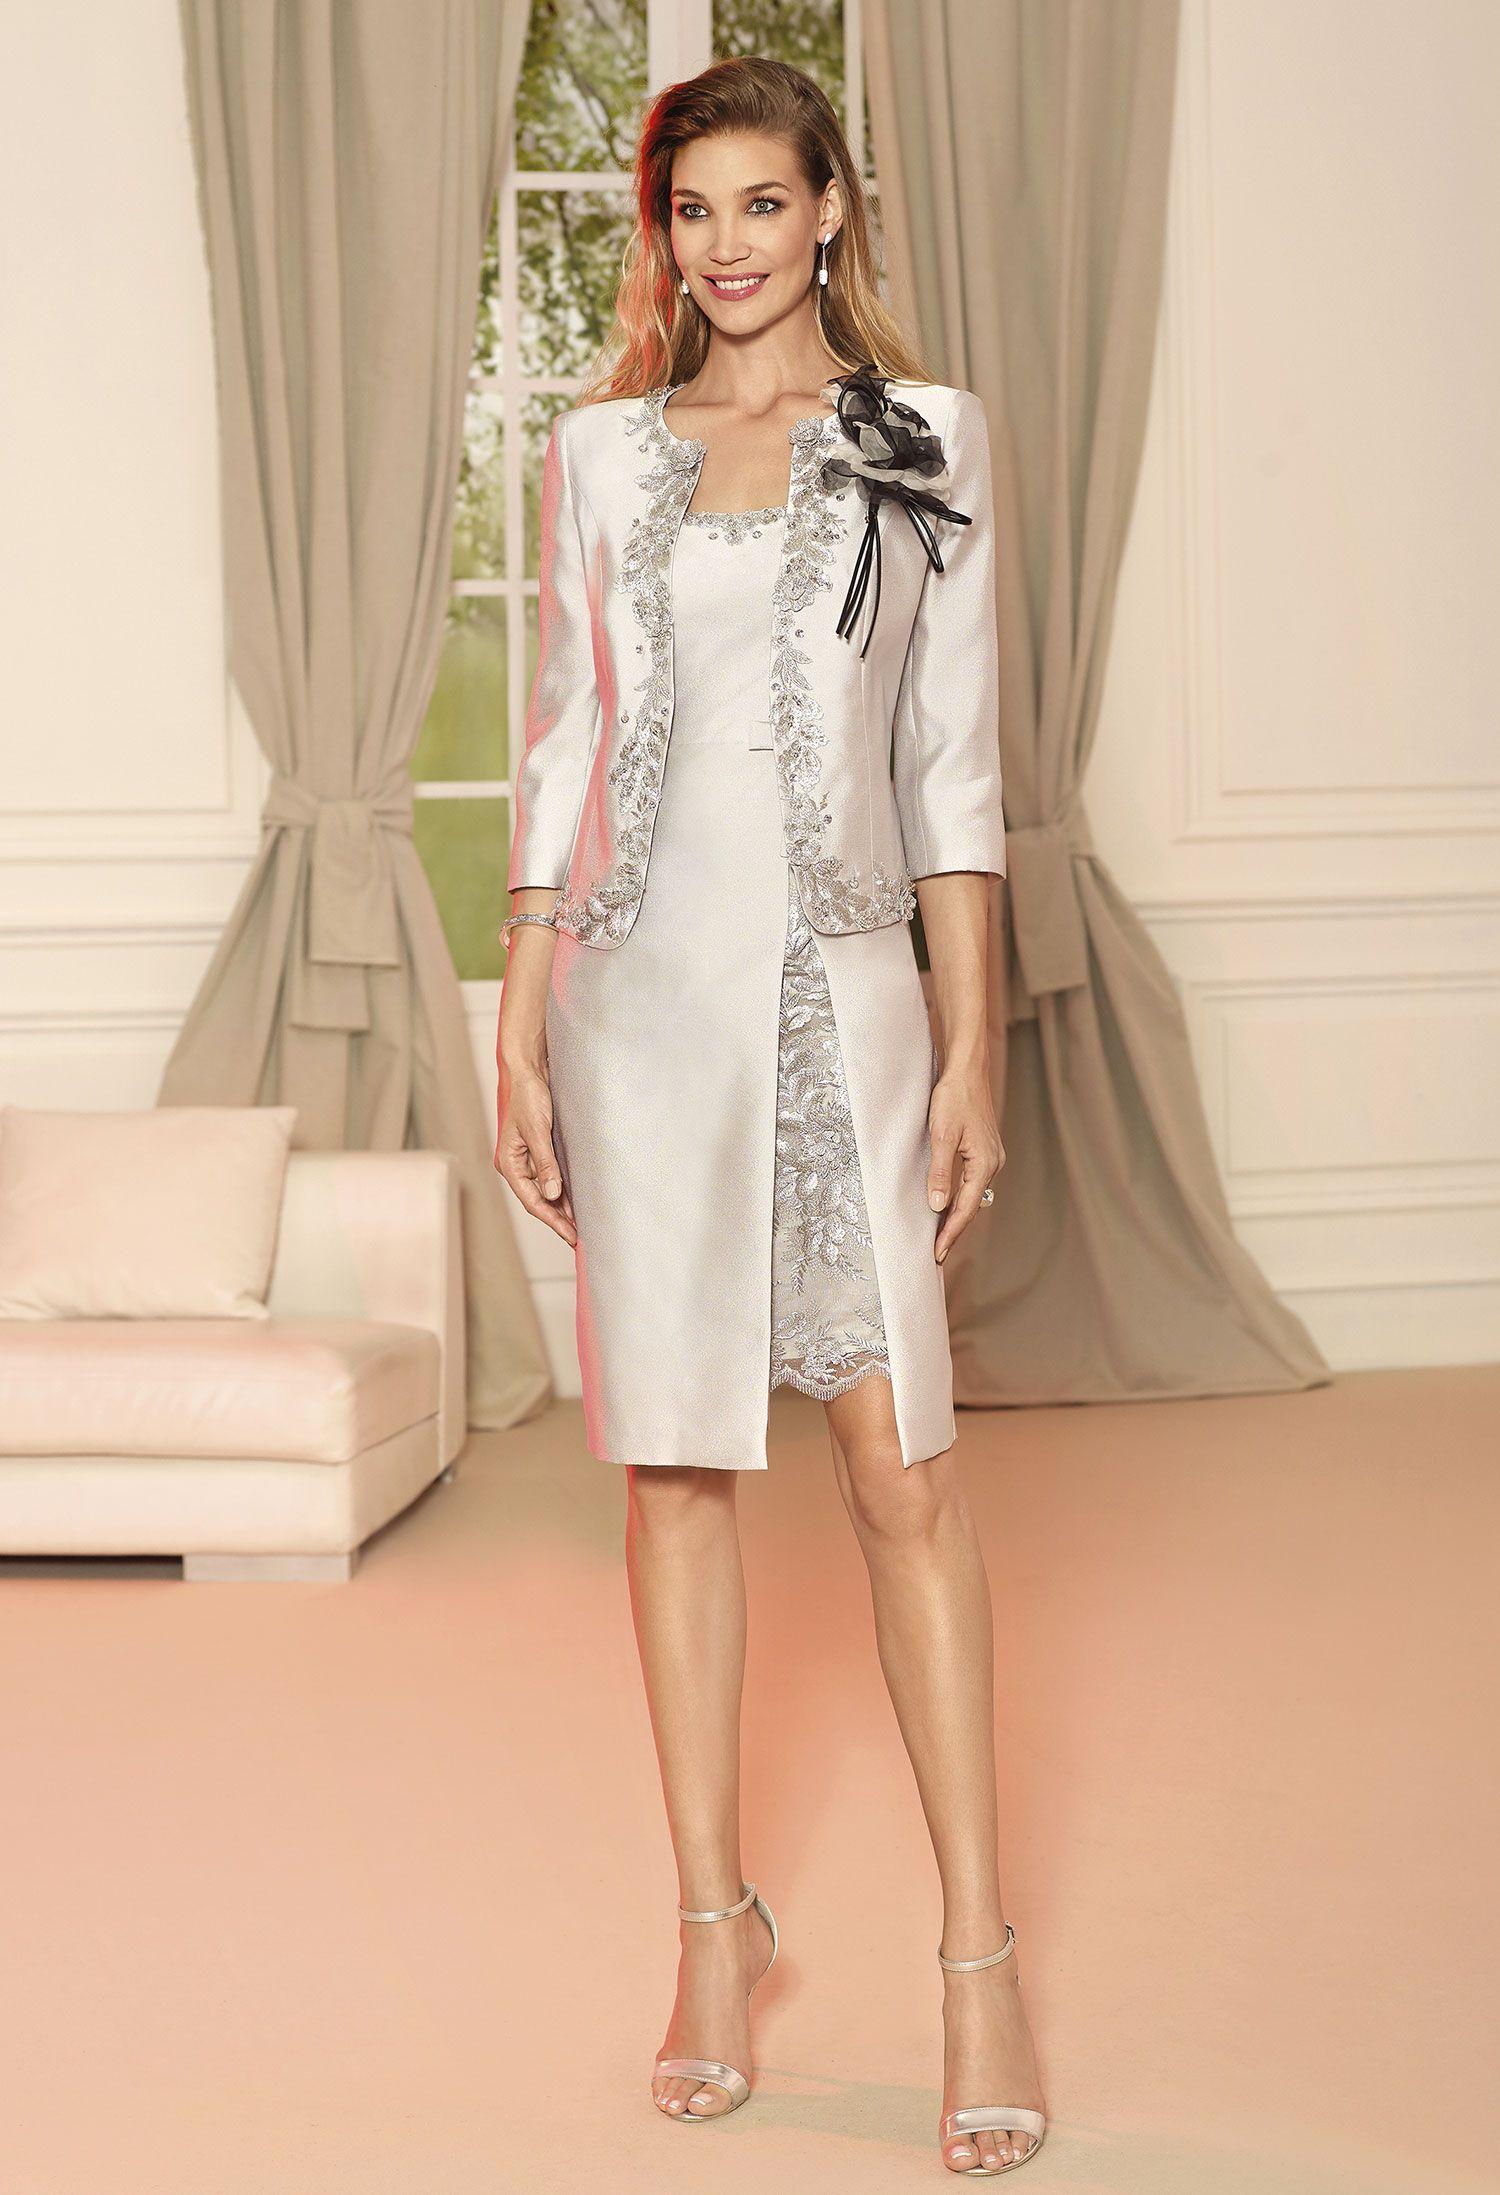 Dresses Cerimonia TorinoLovely Abiti 2494 Bili 2019 Da Nel FKc1TlJ